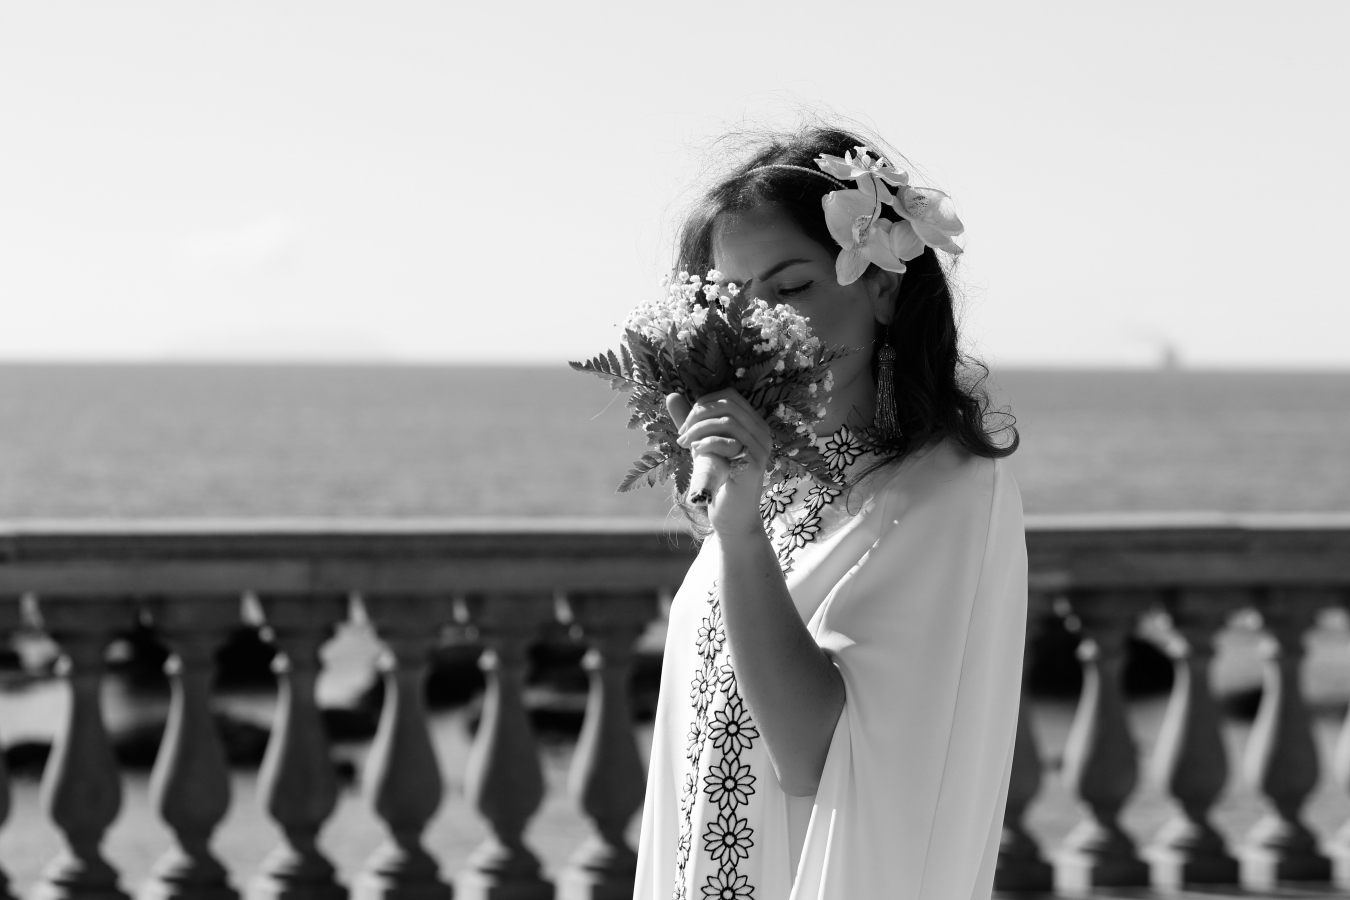 matrimonio all'italiana storie noir stellina abito bianco